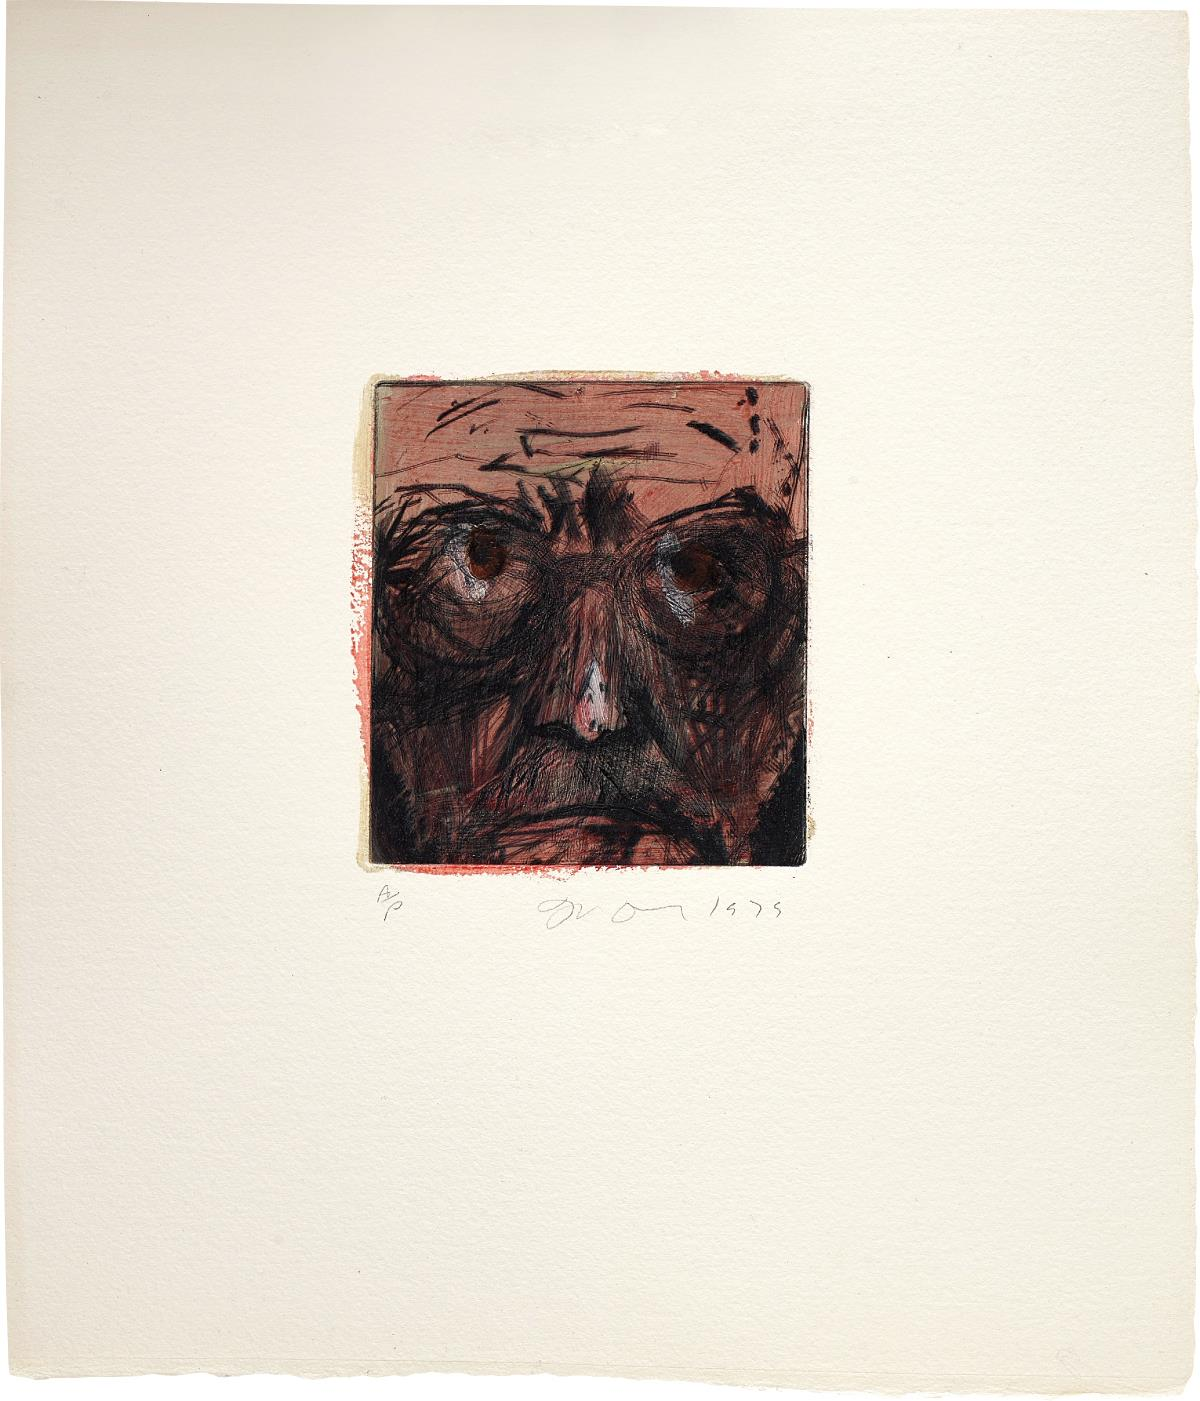 Jim Dine-Self-Portrait Hand Painted In Paris-1979